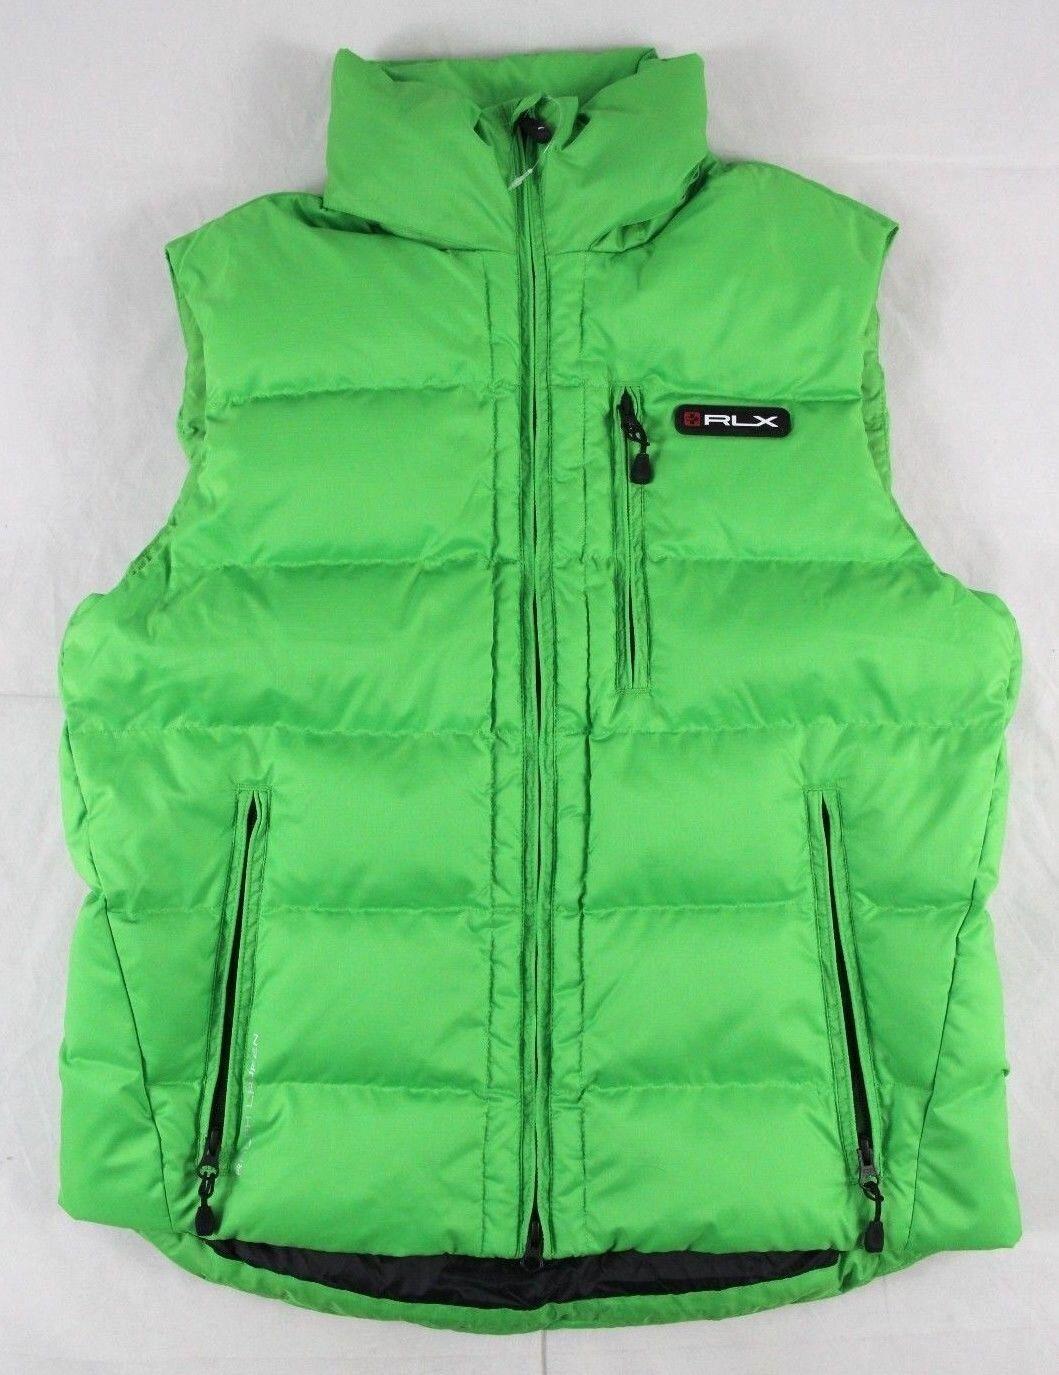 Ralph Lauren RLX Green Full Zip Nylon Lined Down Filled Vest Size S BNWT